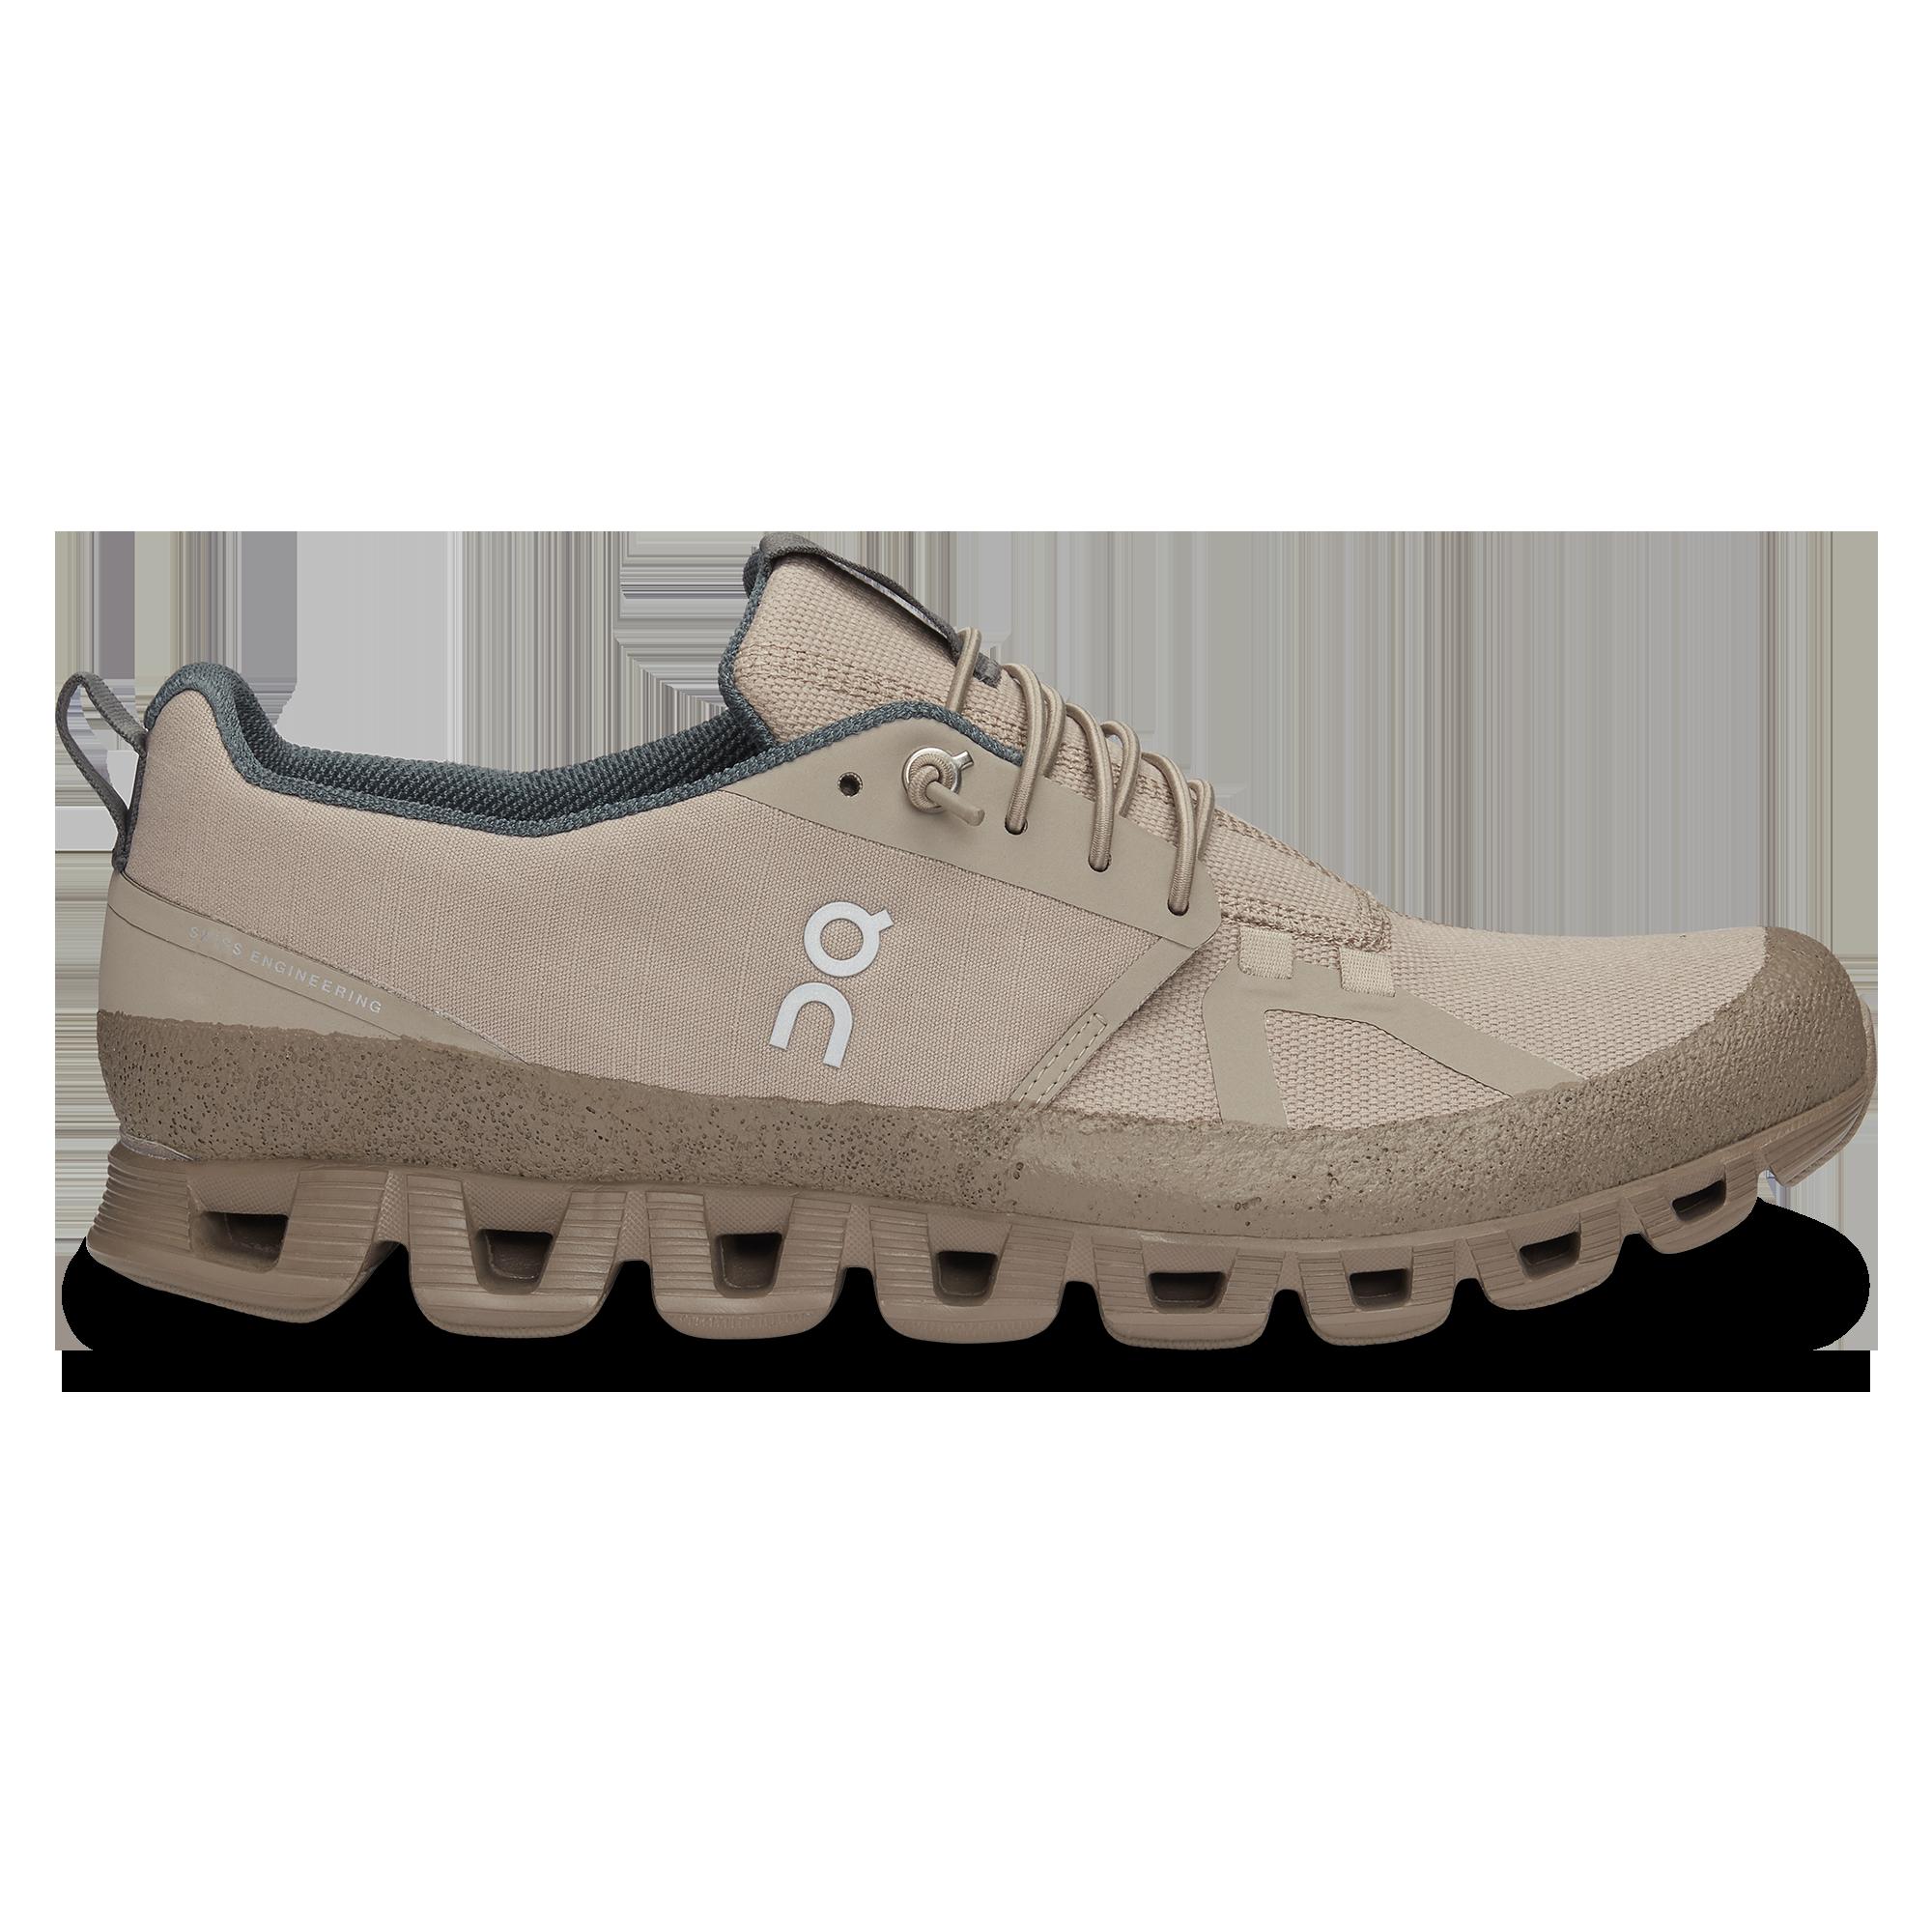 Cloud Dip - The lightweight shoe that's